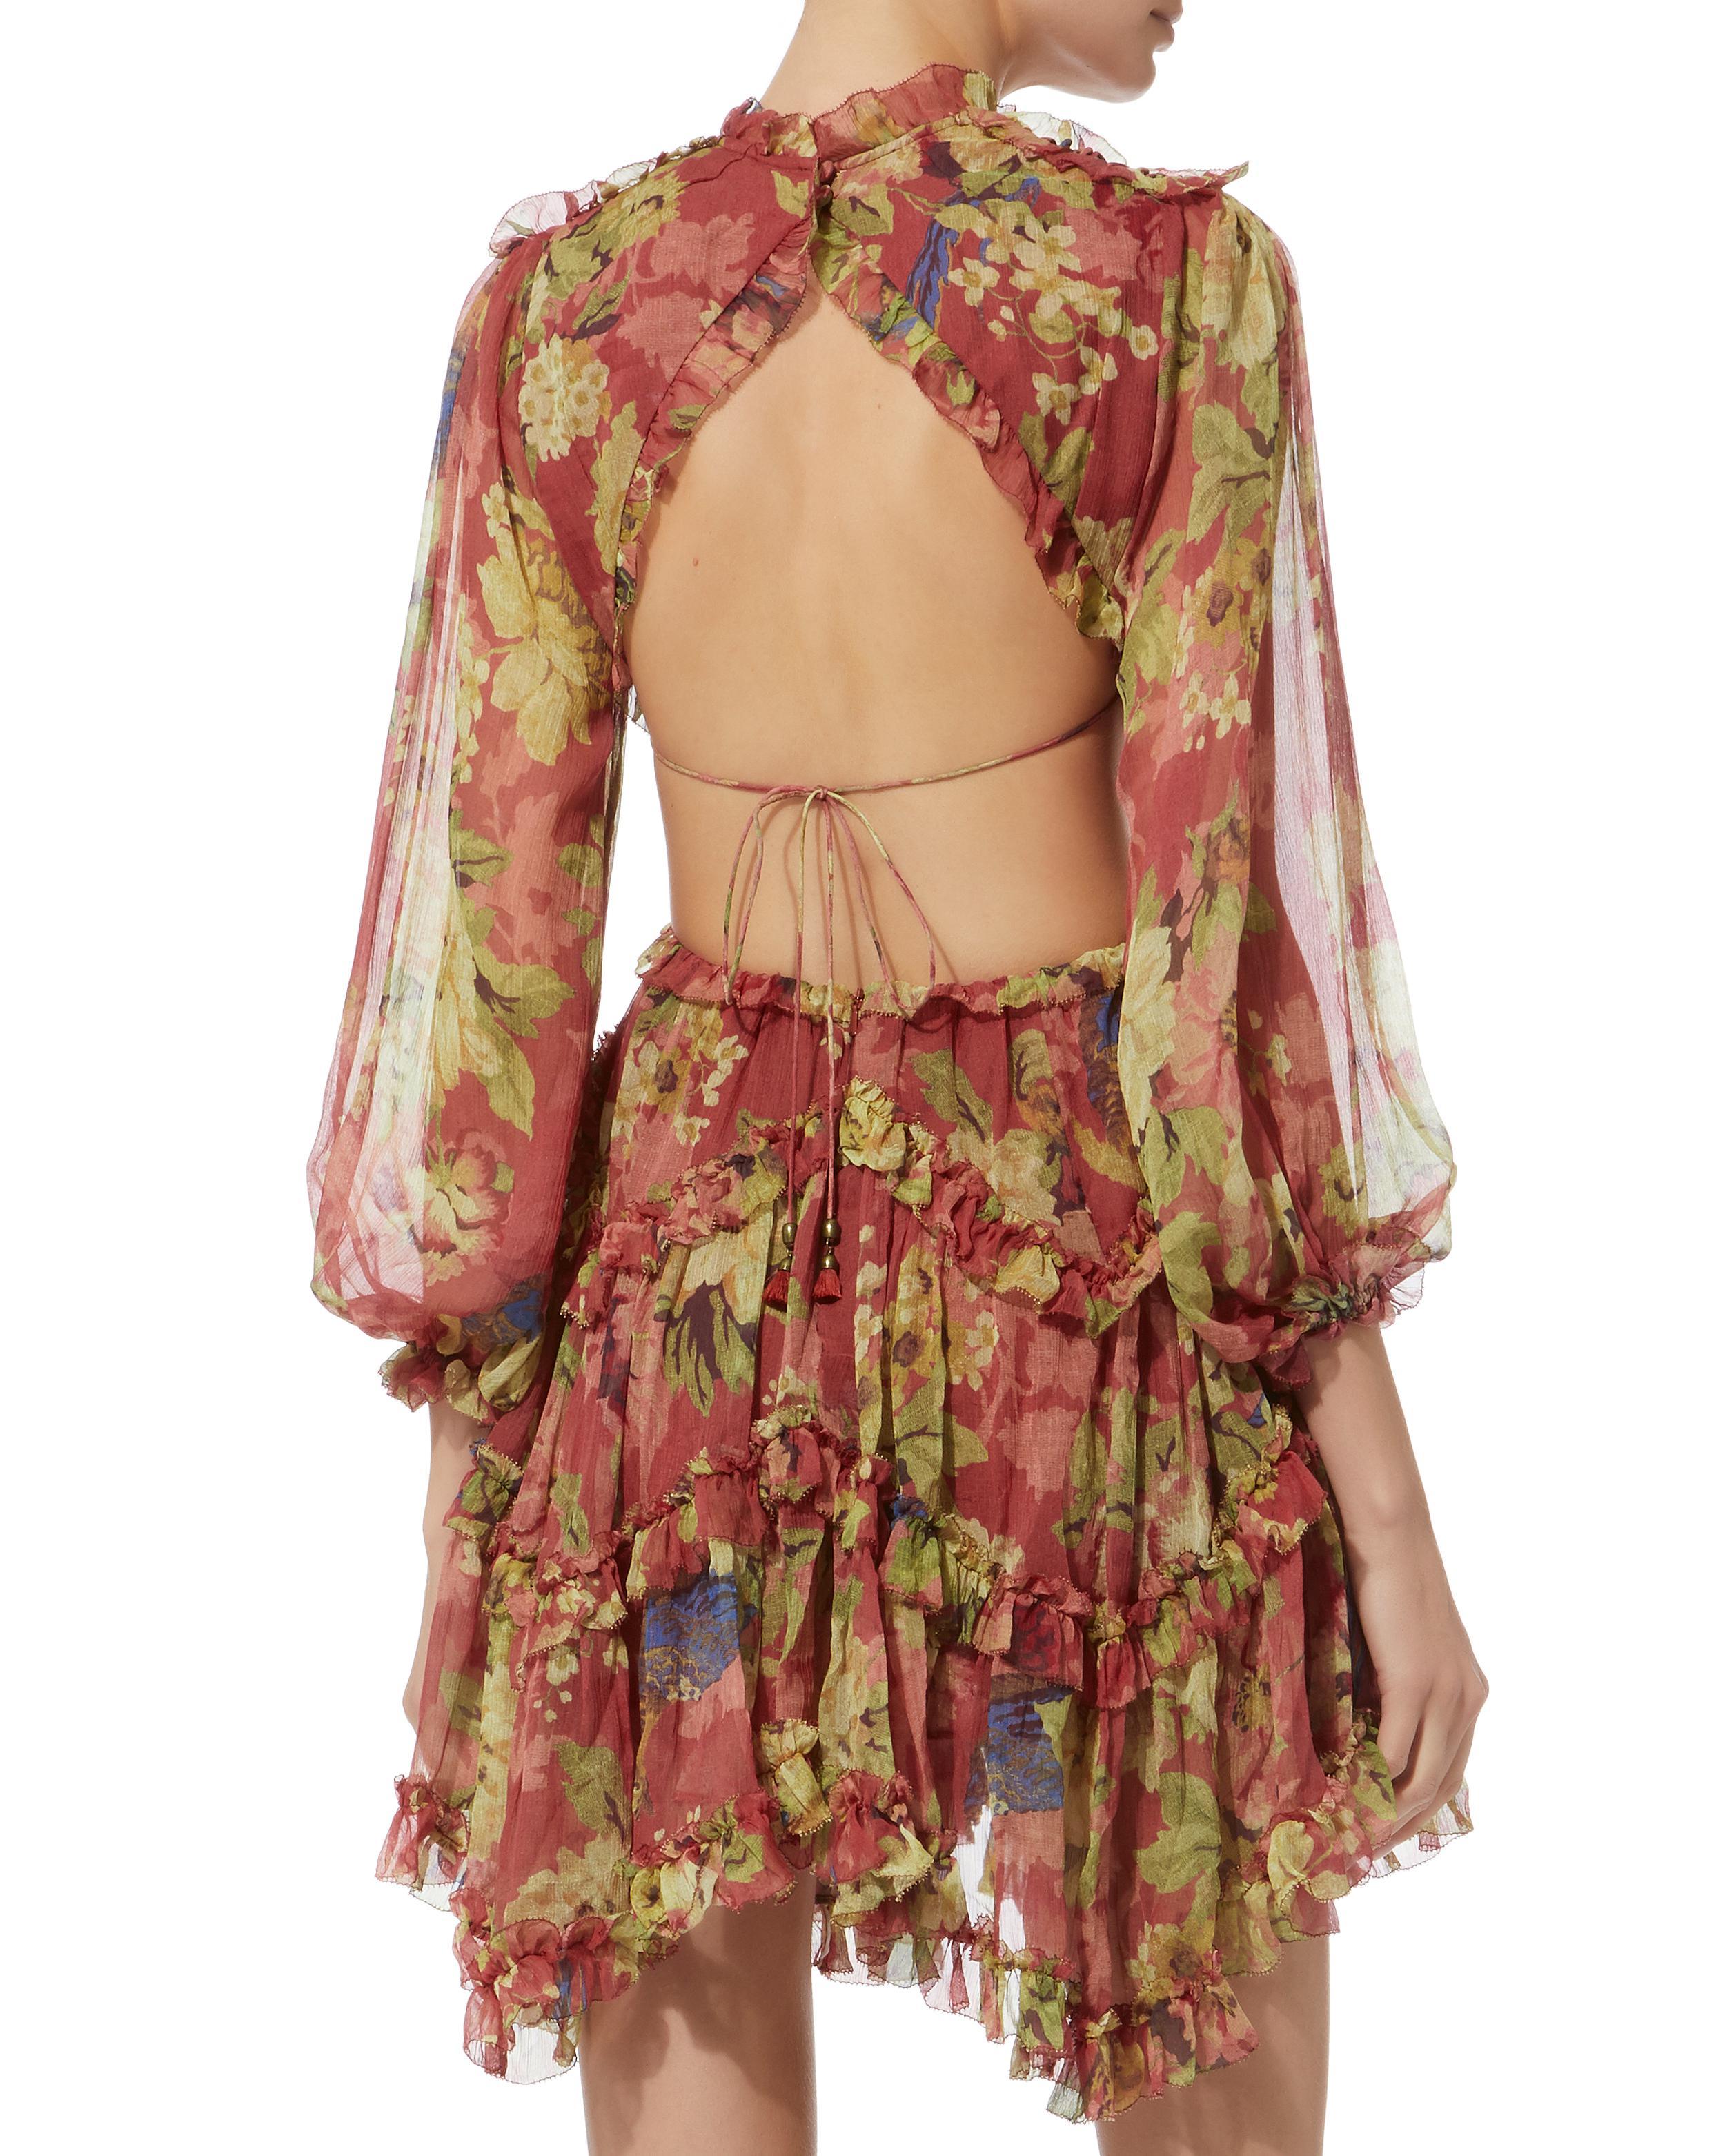 ab32ecff36e67 Zimmermann Melody Lace-up Short Dress - Lyst